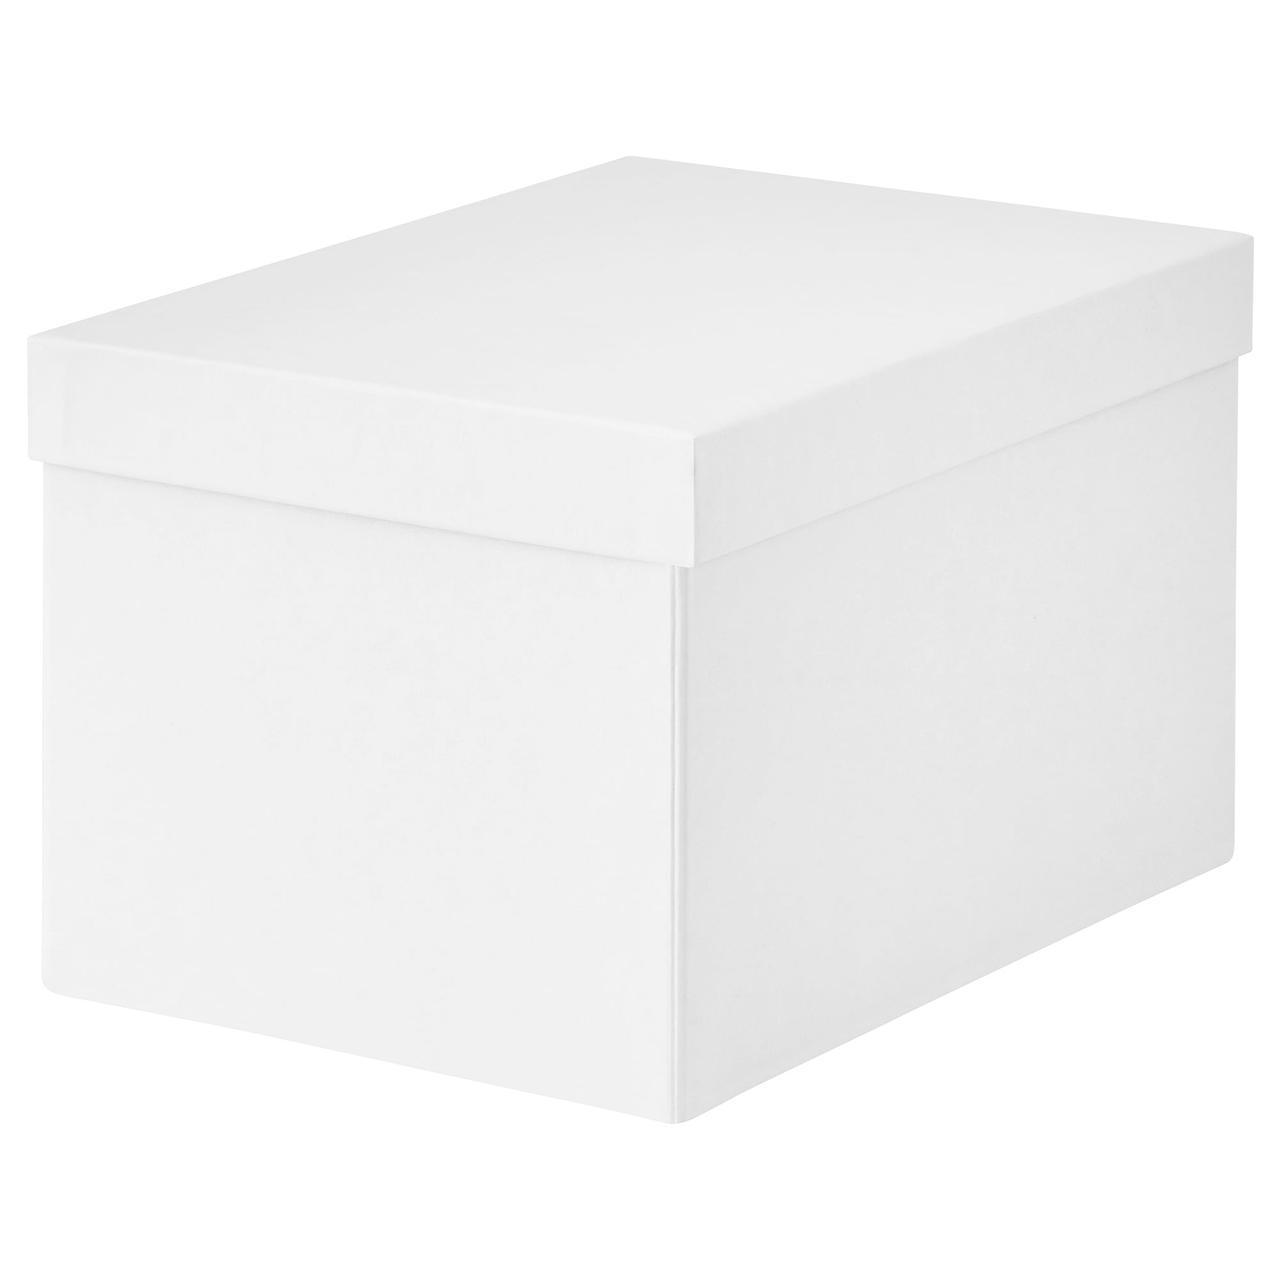 IKEA TJENA (103.954.21) Контейнер с крышкой